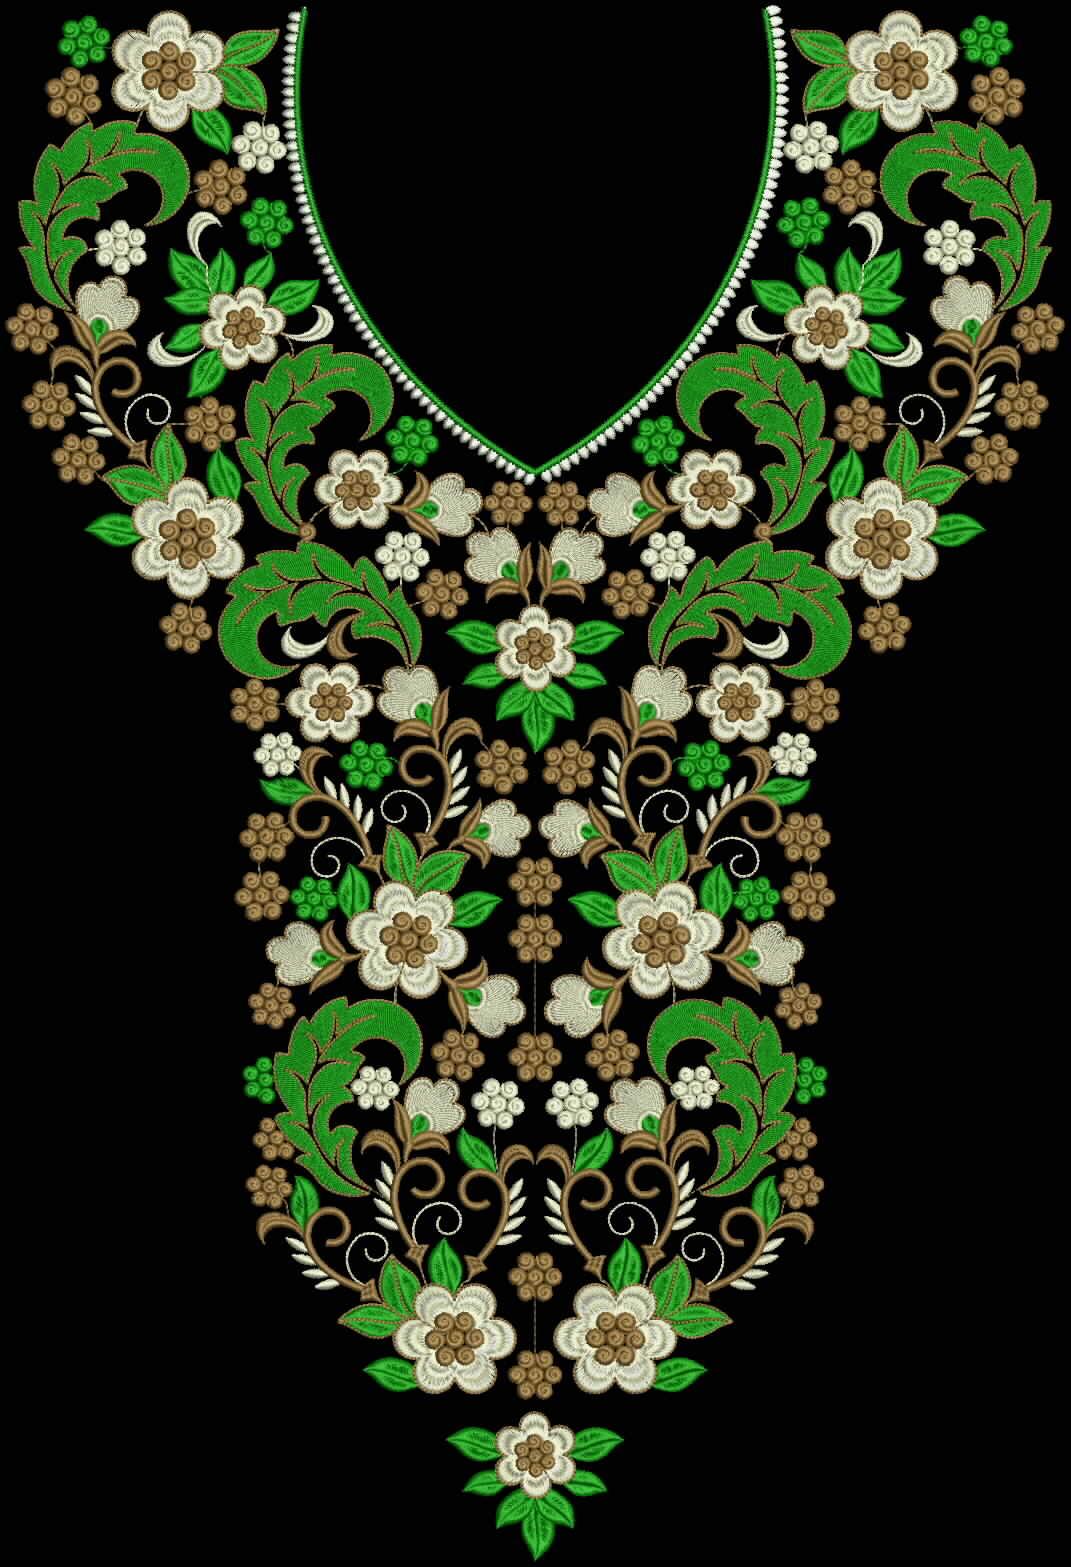 Loker embroidery designs